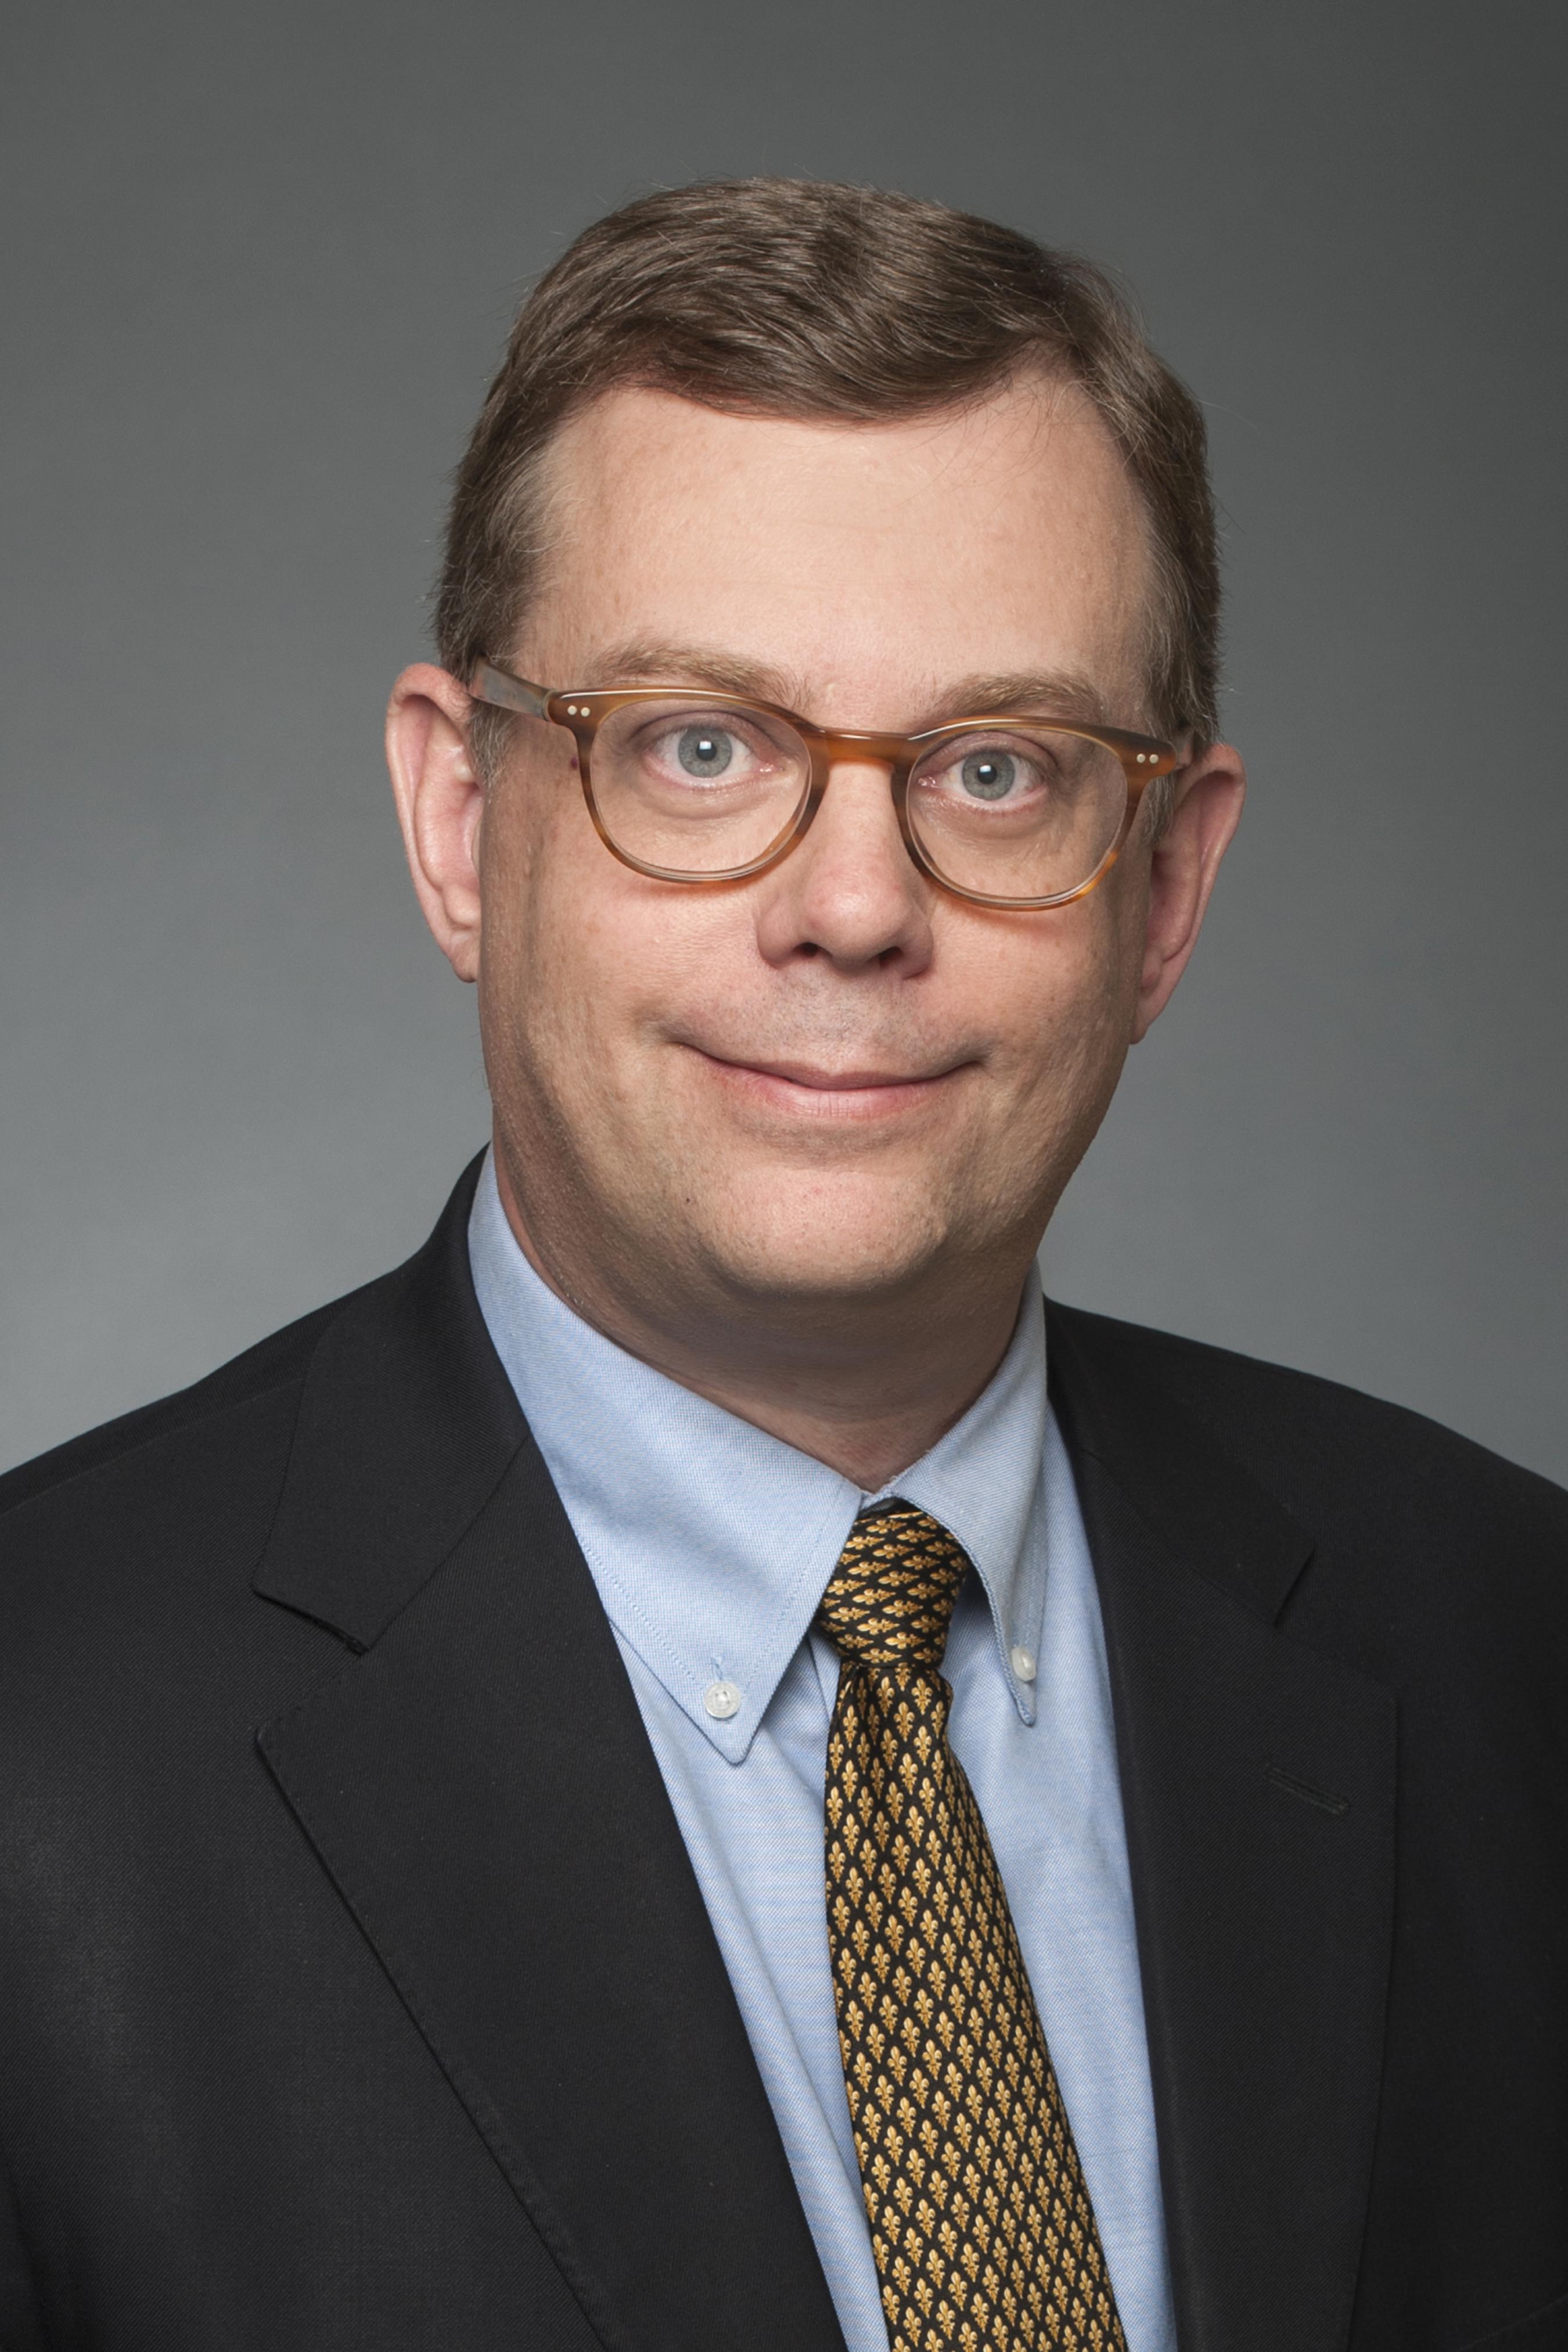 Dr John Leddy